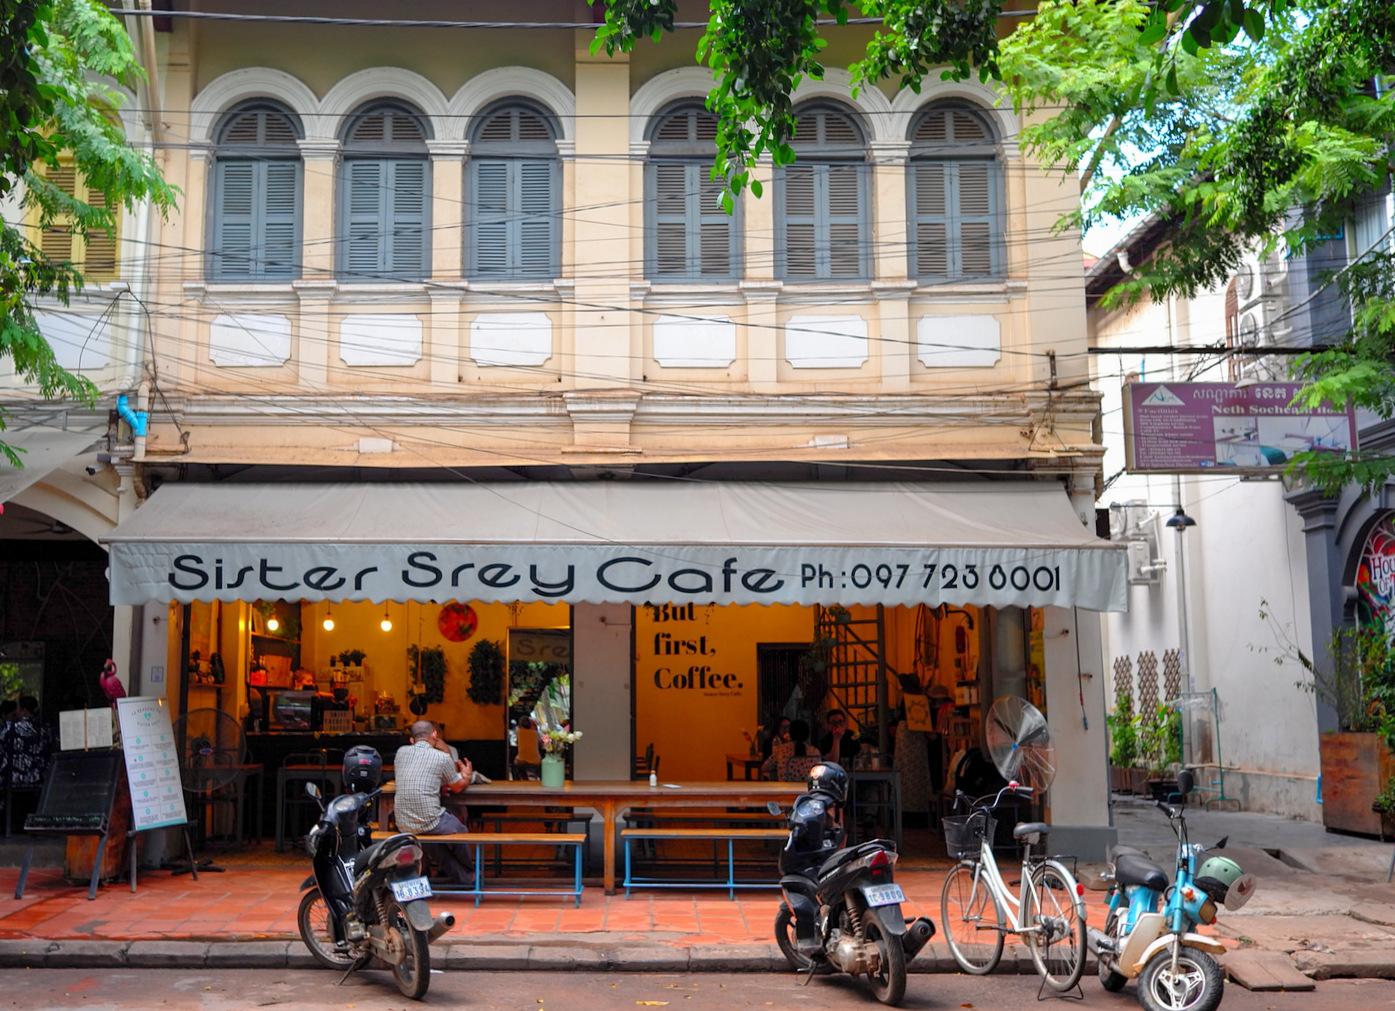 sister srey cafe, siem reap, cambodia